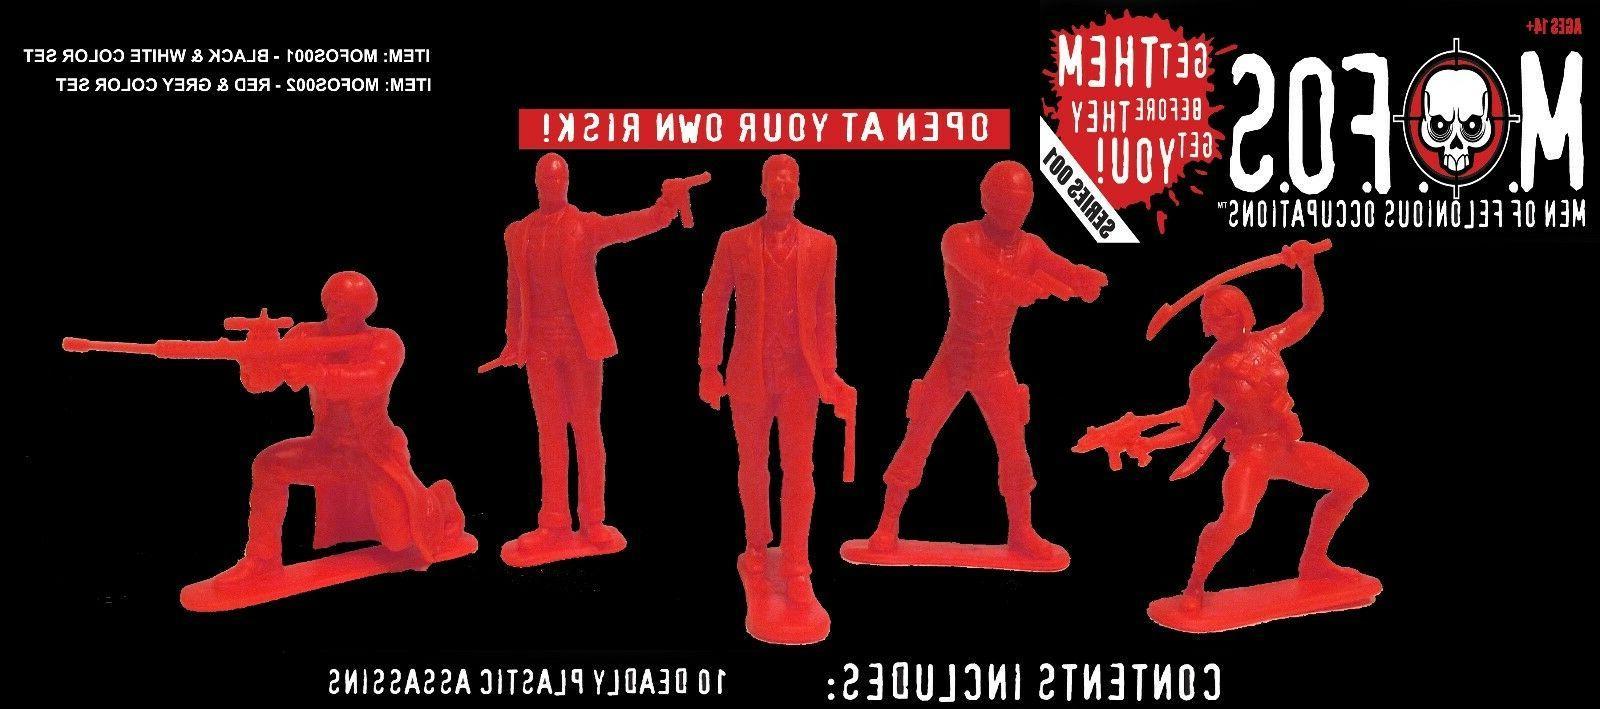 M.O.F.O.s Men Occupations men